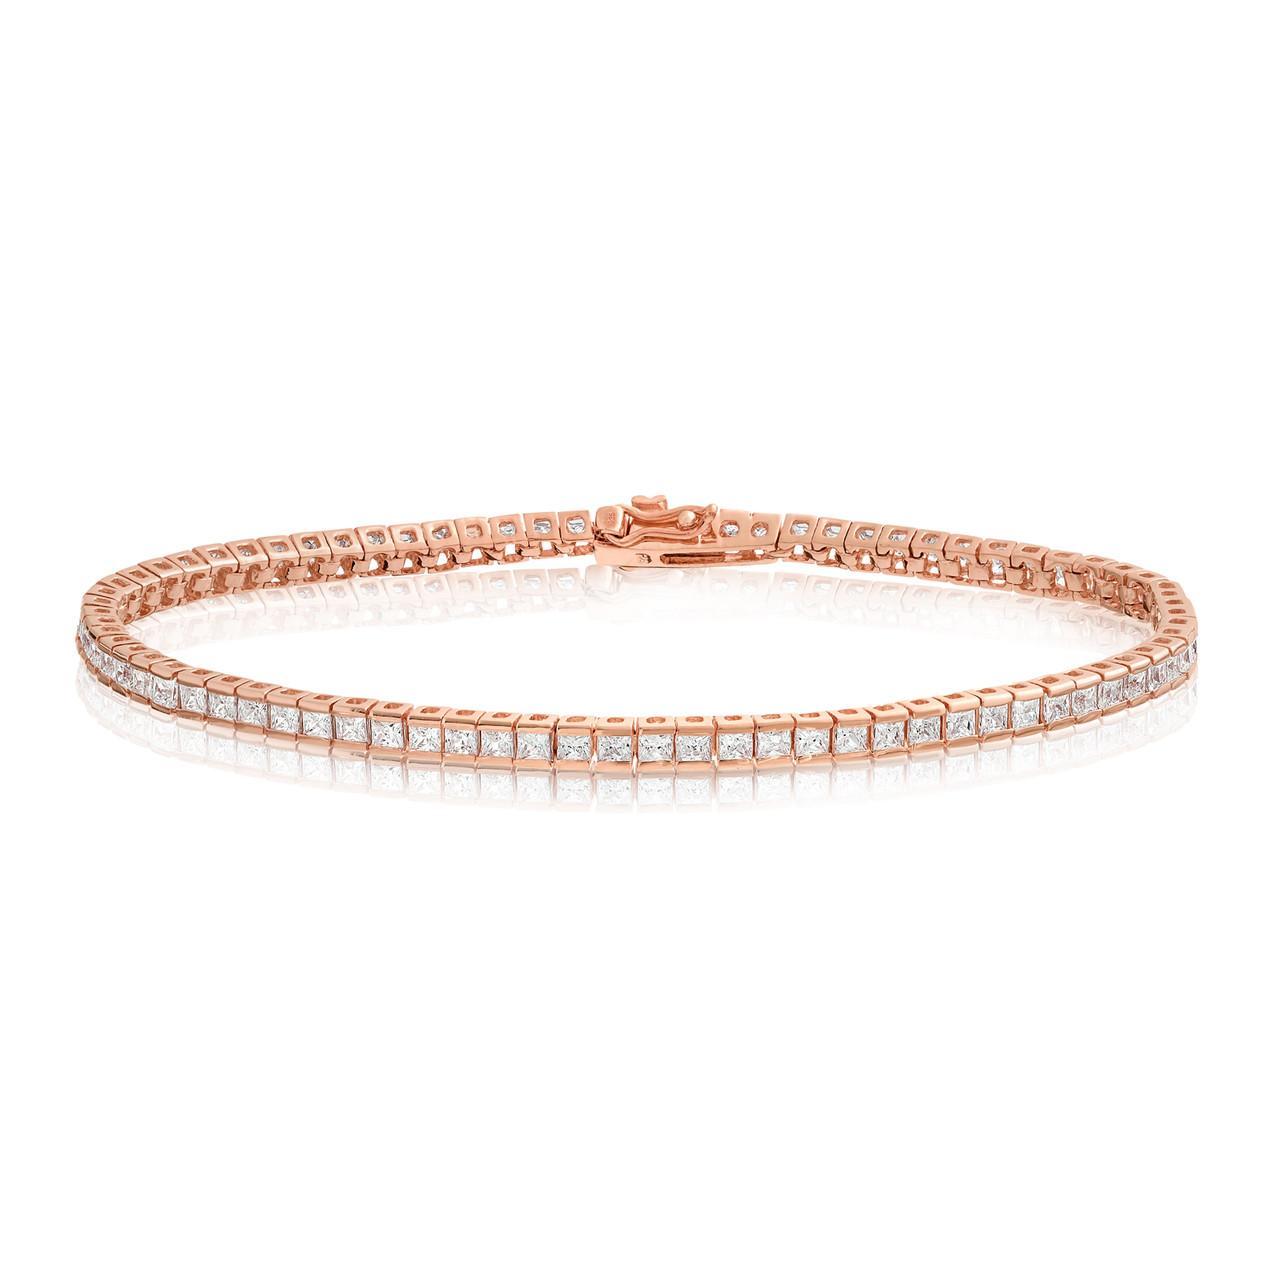 9b63ac18a4091 Cubic Zirconia Tennis Bracelet Rose Gold Plated 2x2mm Square White CZ